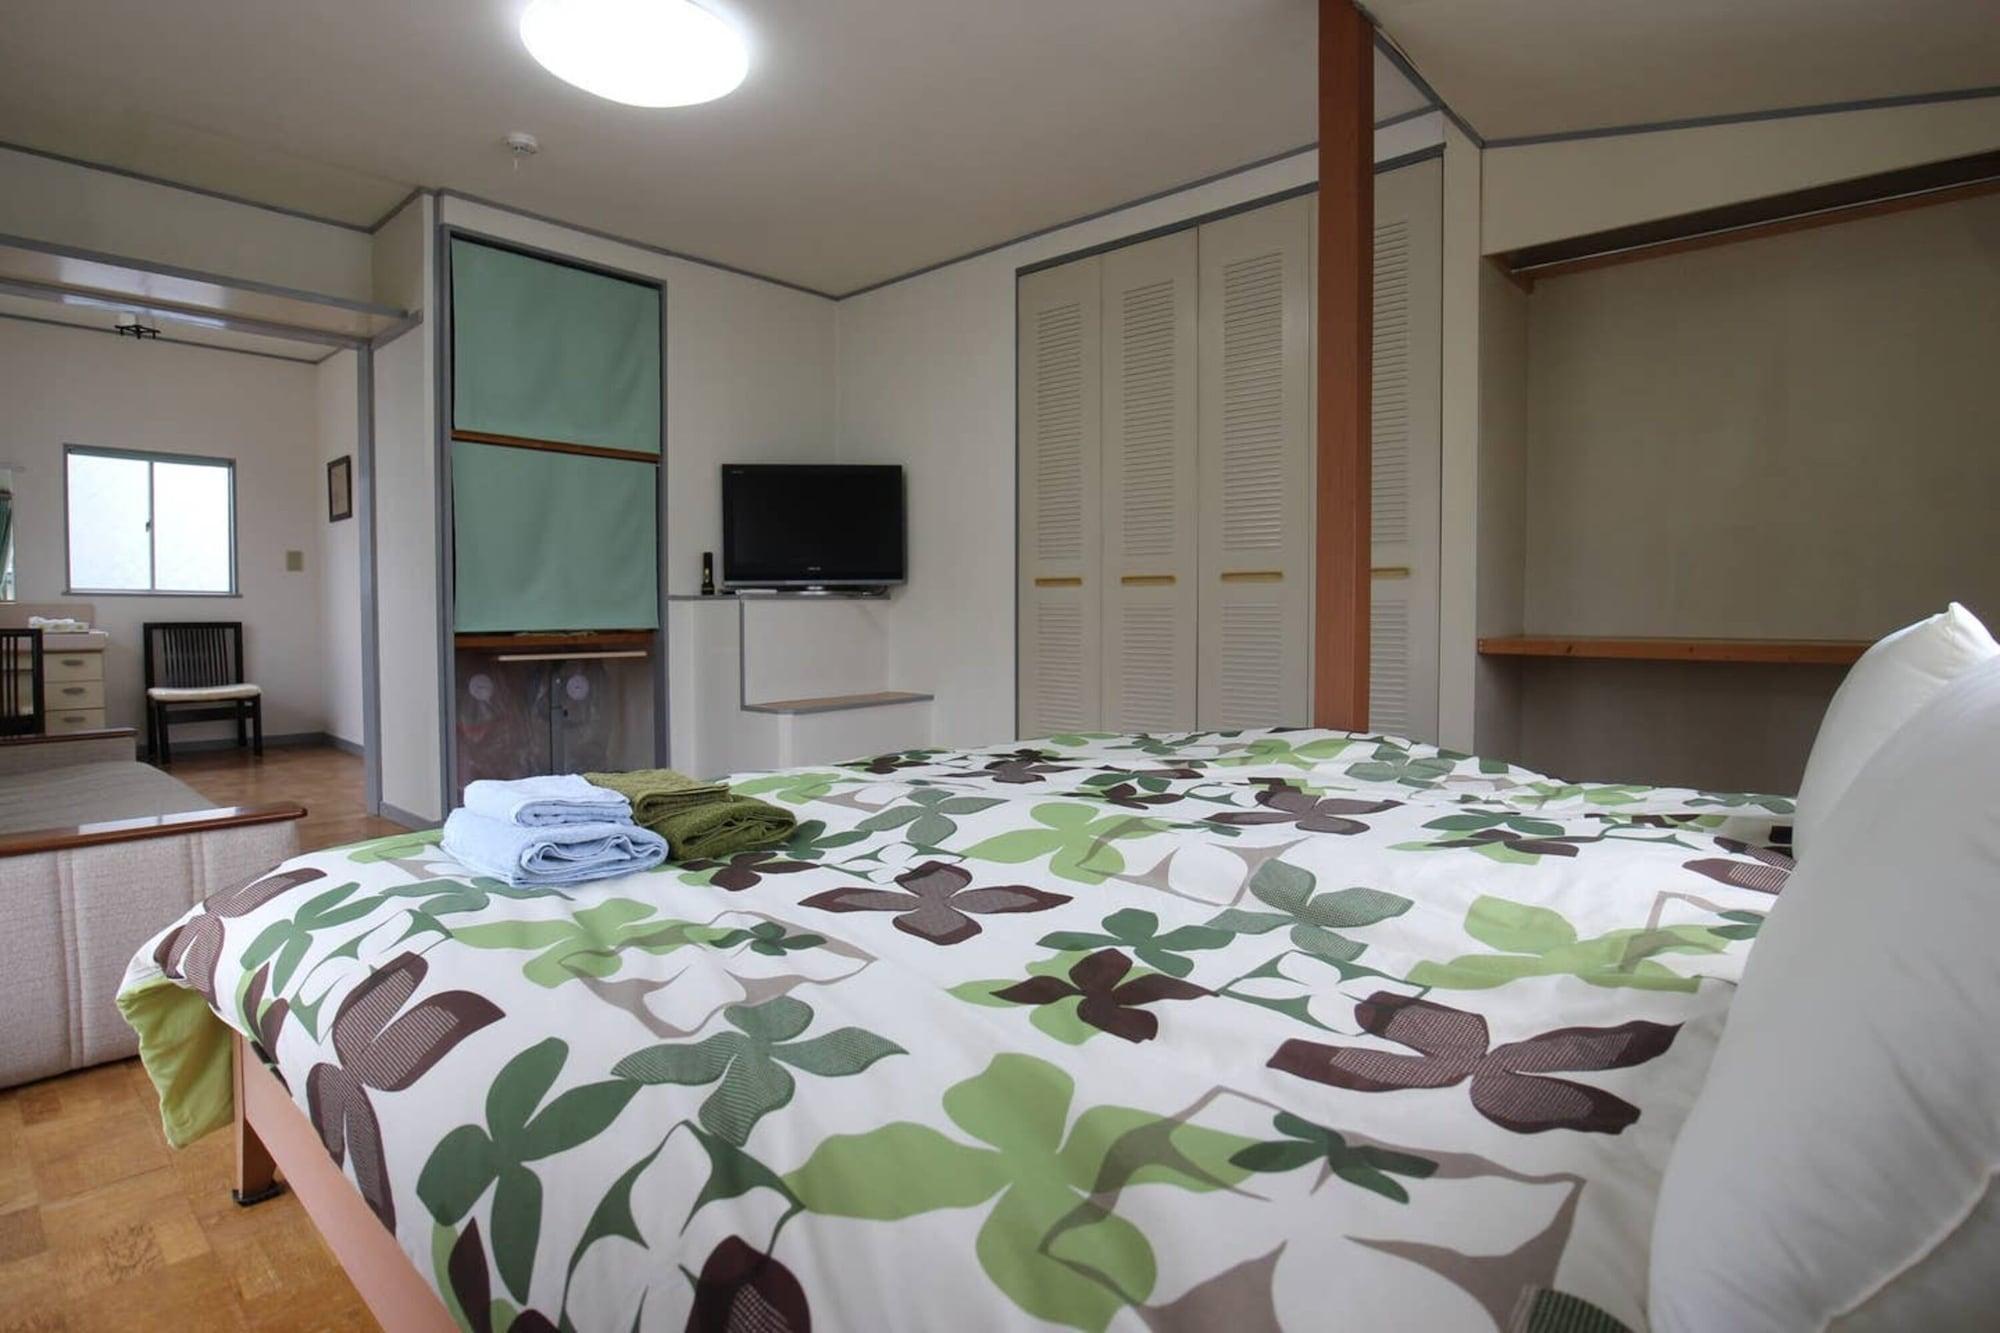 Precious House in Chigasaki Beach resort, Chigasaki